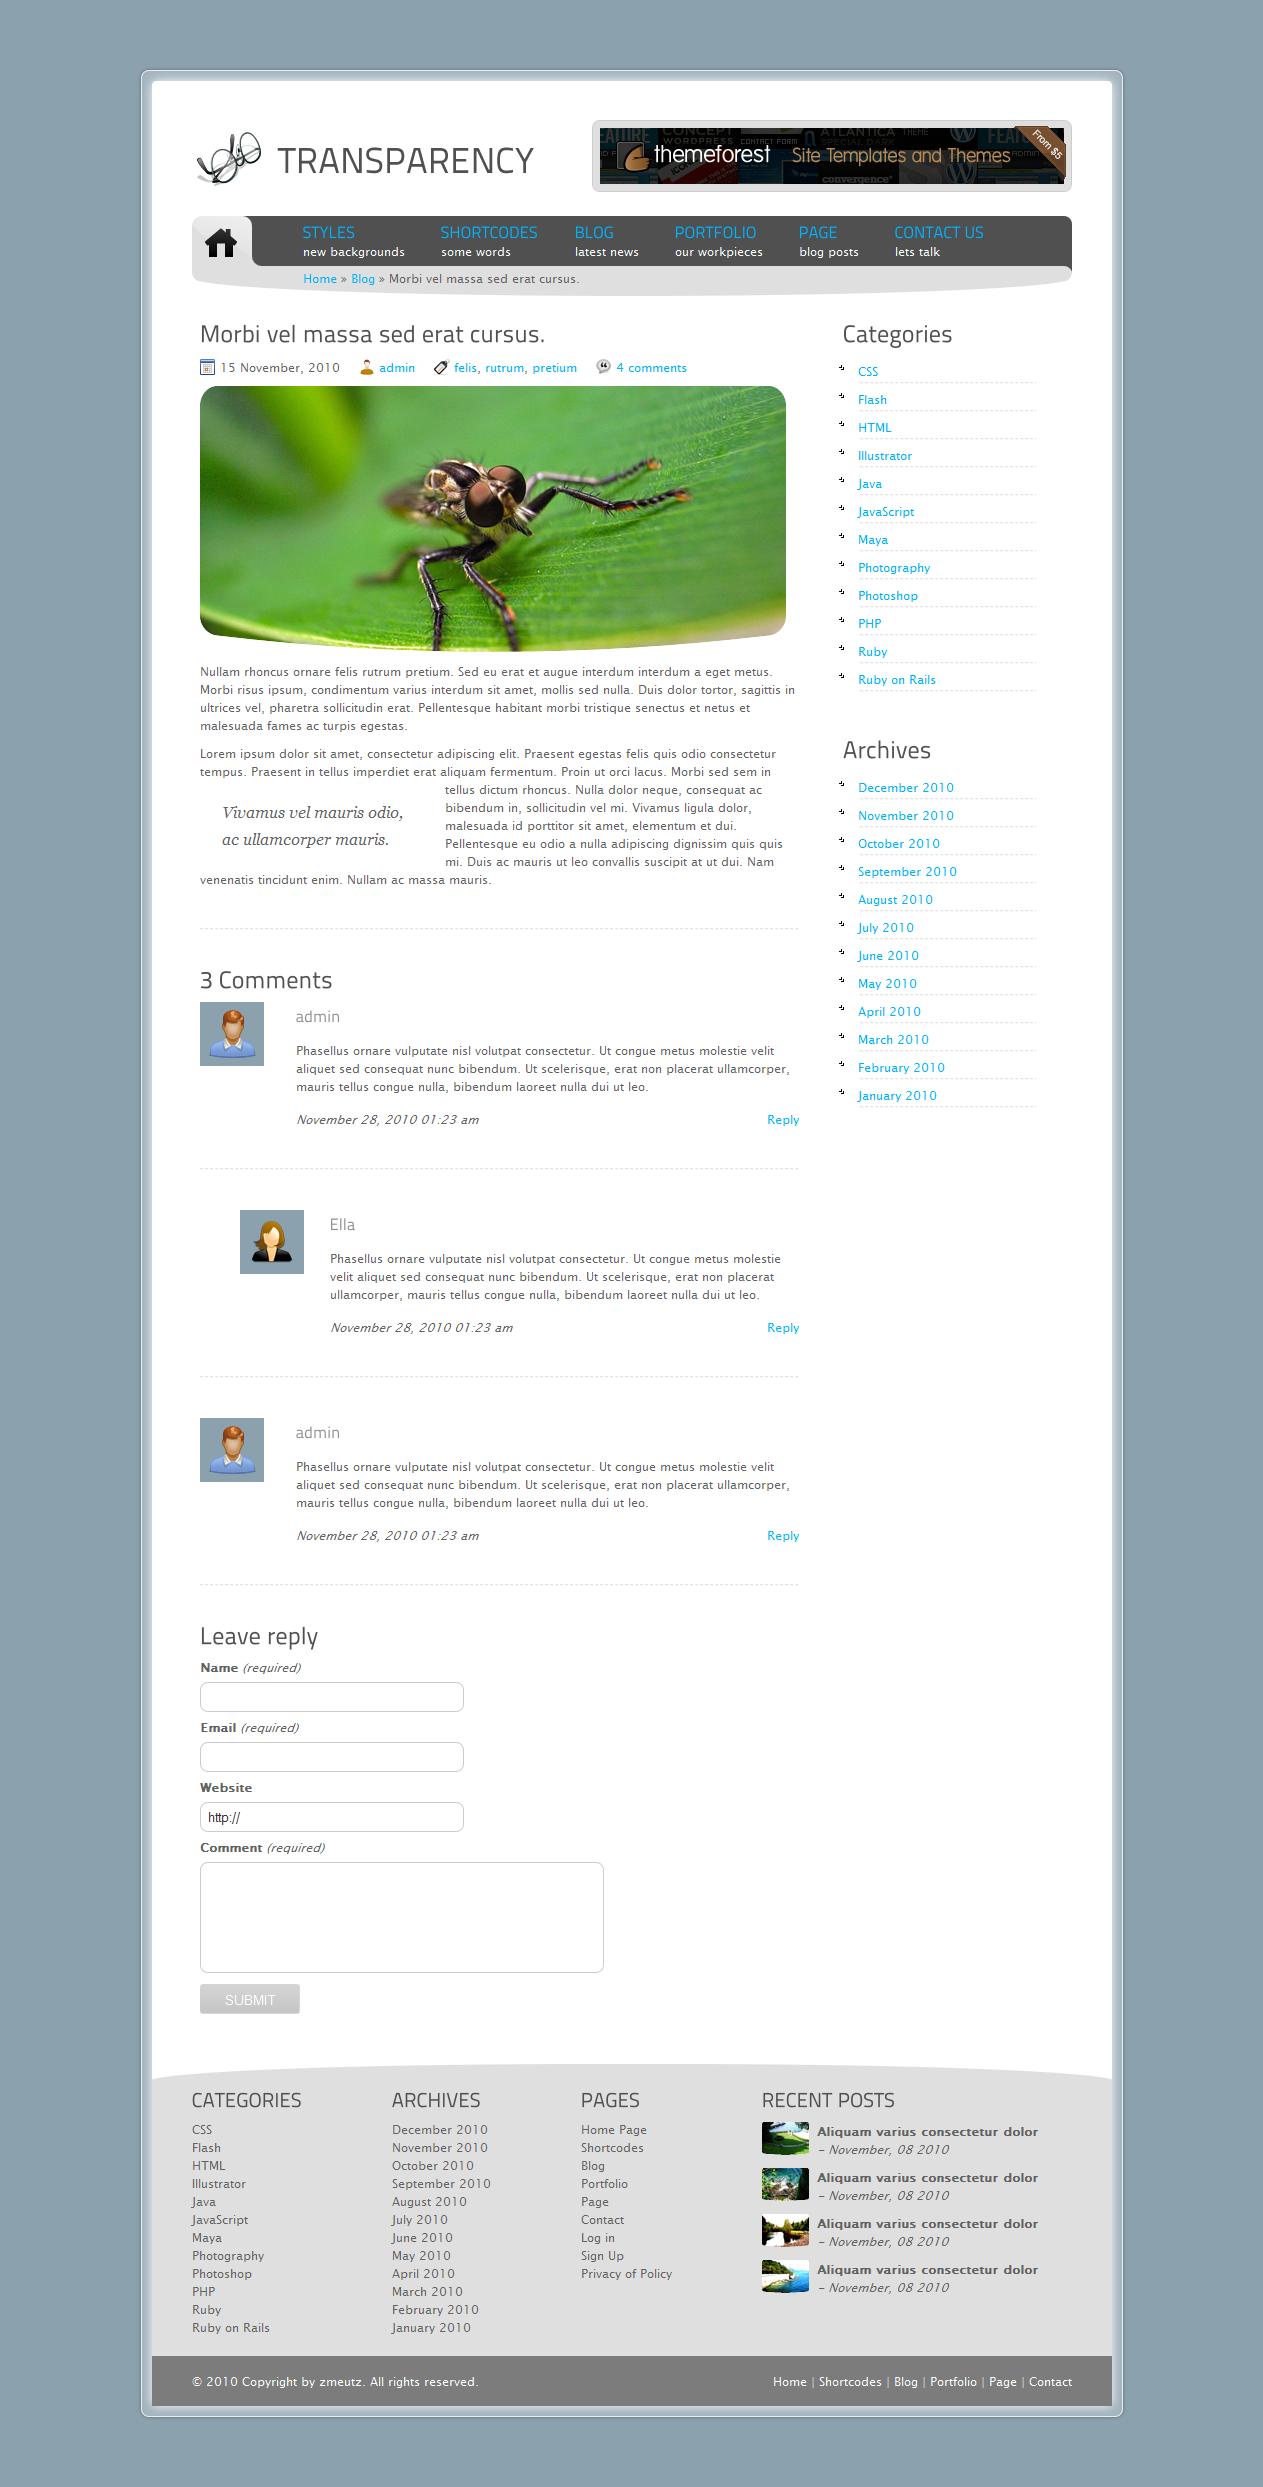 Tranzparency - Wordpress - Blog post - Morbi vel massa sed erat cursus